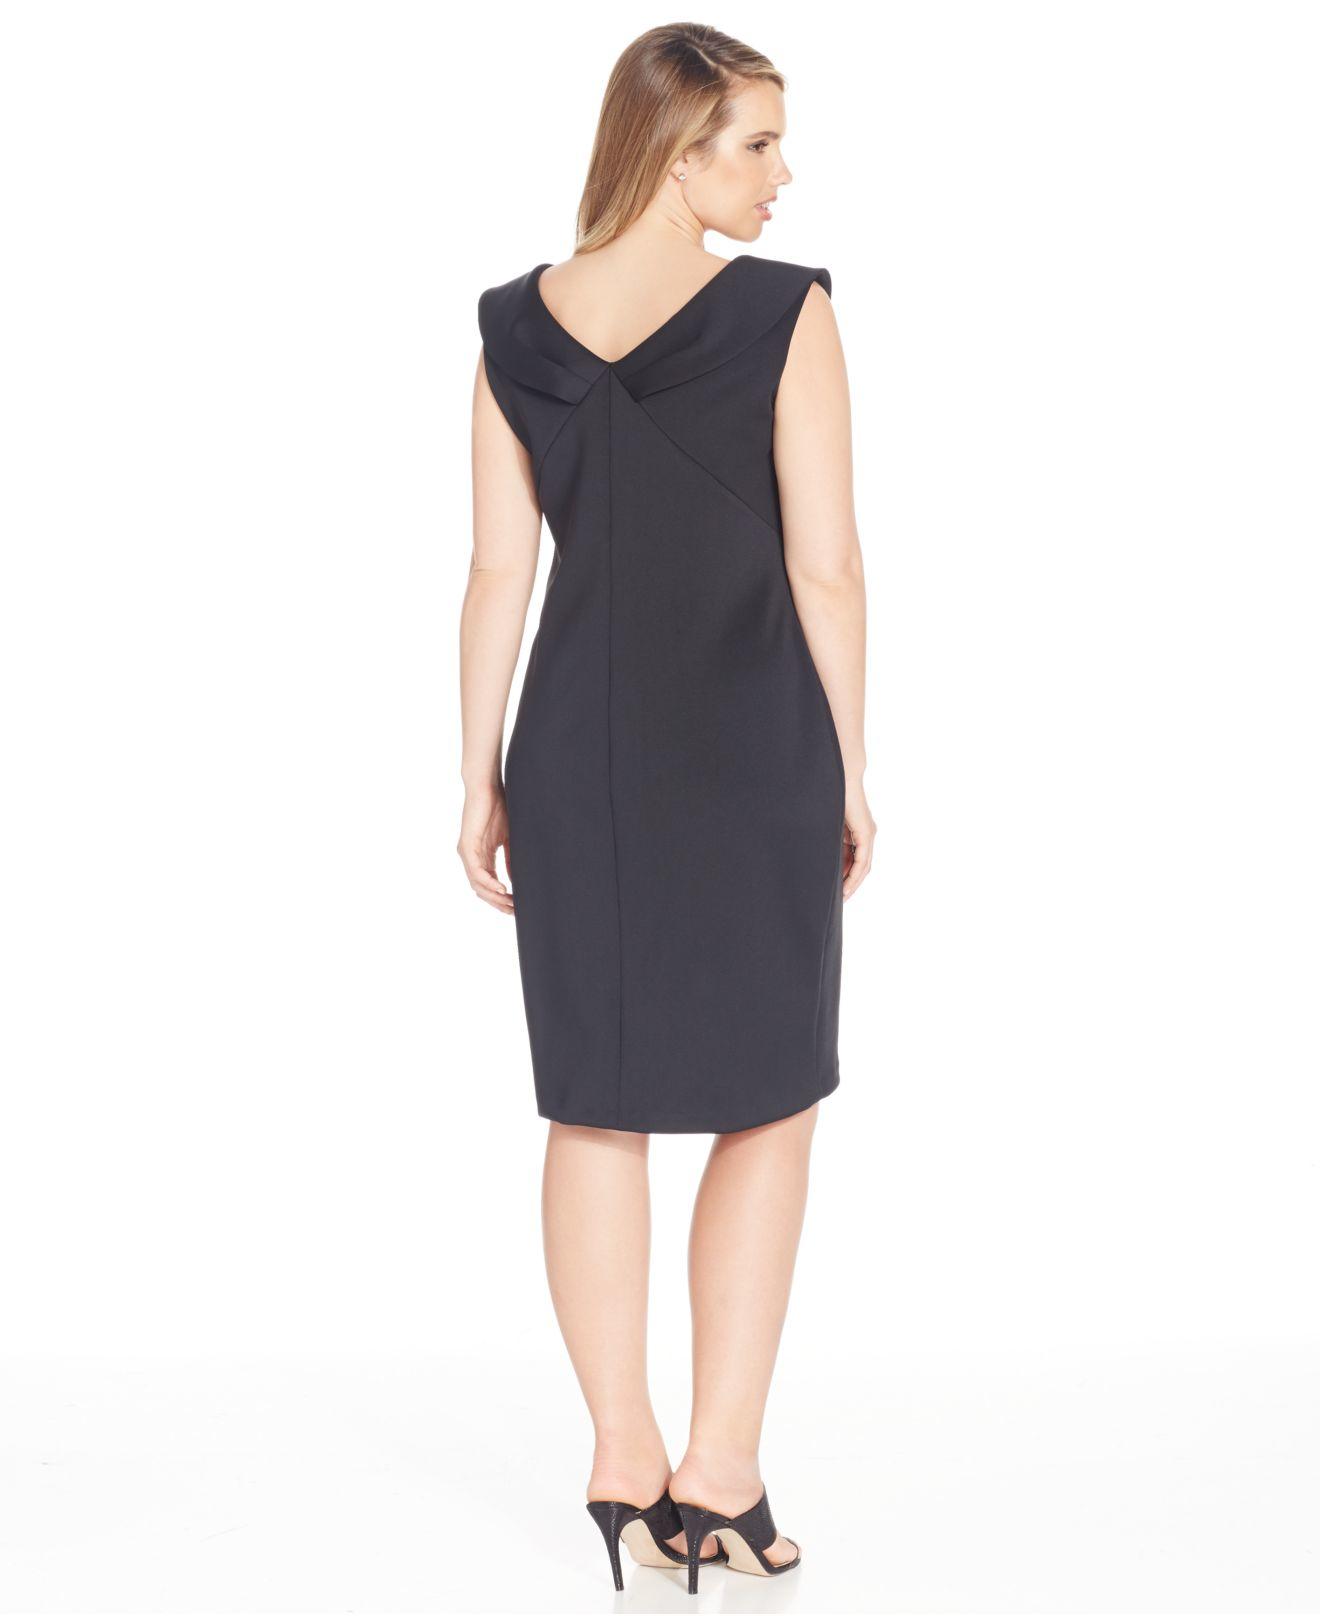 HD wallpapers calvin klein plus size zip front sleeveless dress